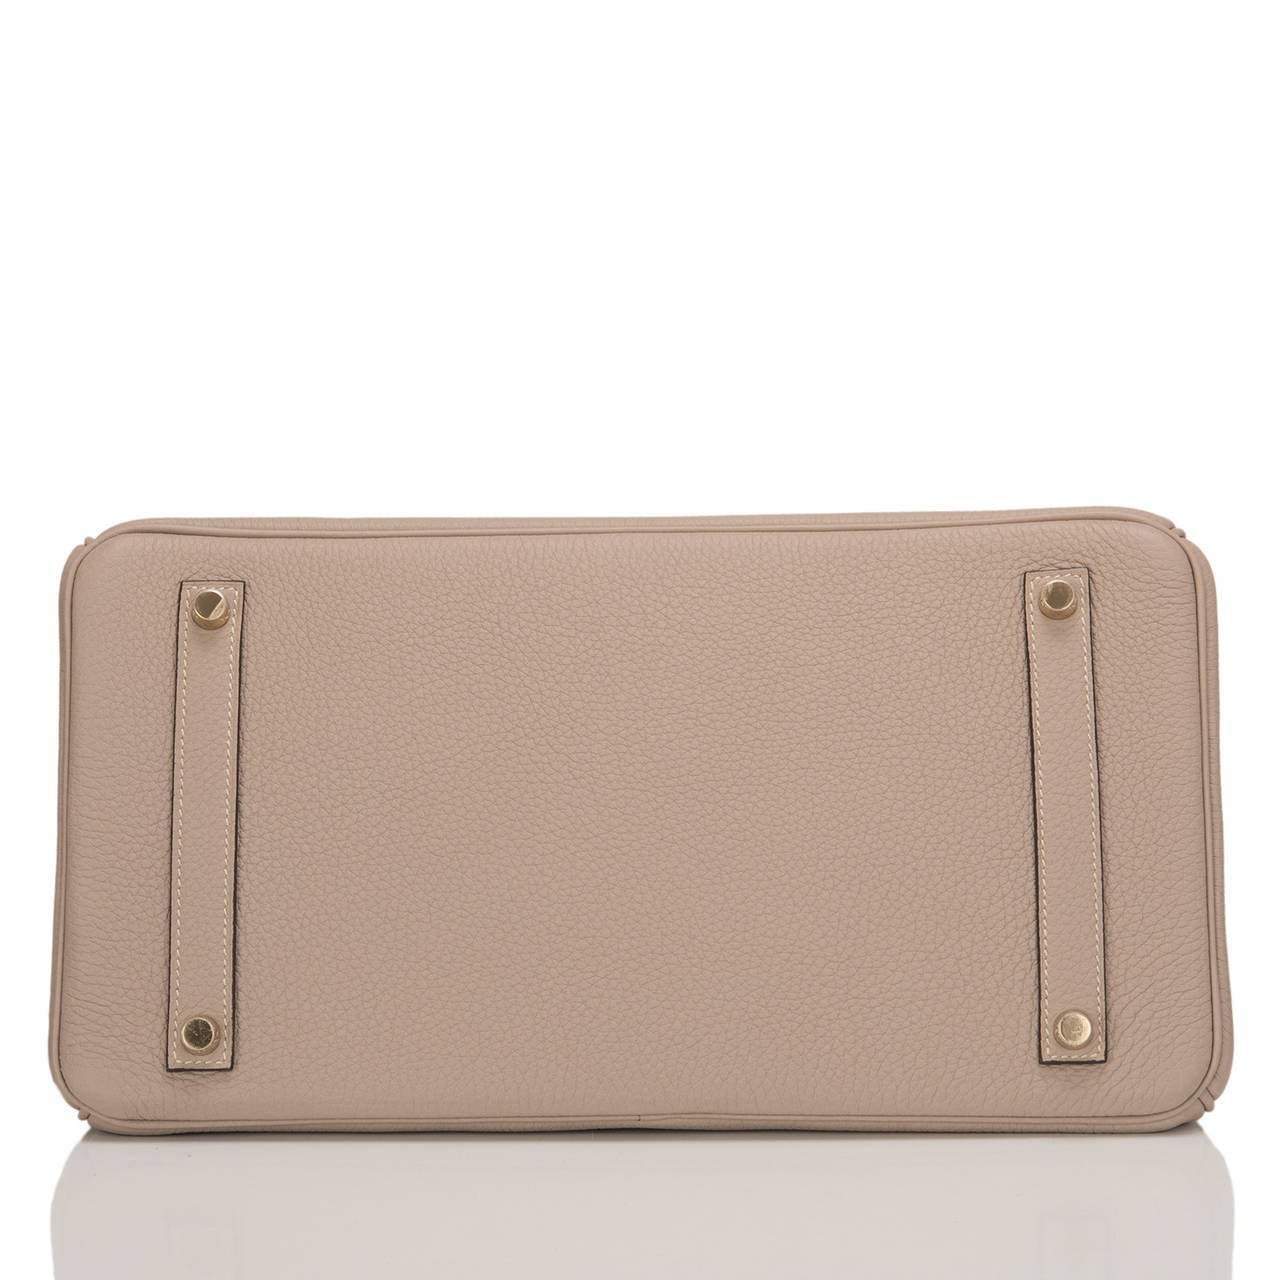 0d930f7e90 ... herme bags - Hermes Gris Tourterelle Togo Birkin 35cm Gold Hardware at  1stdibs ...